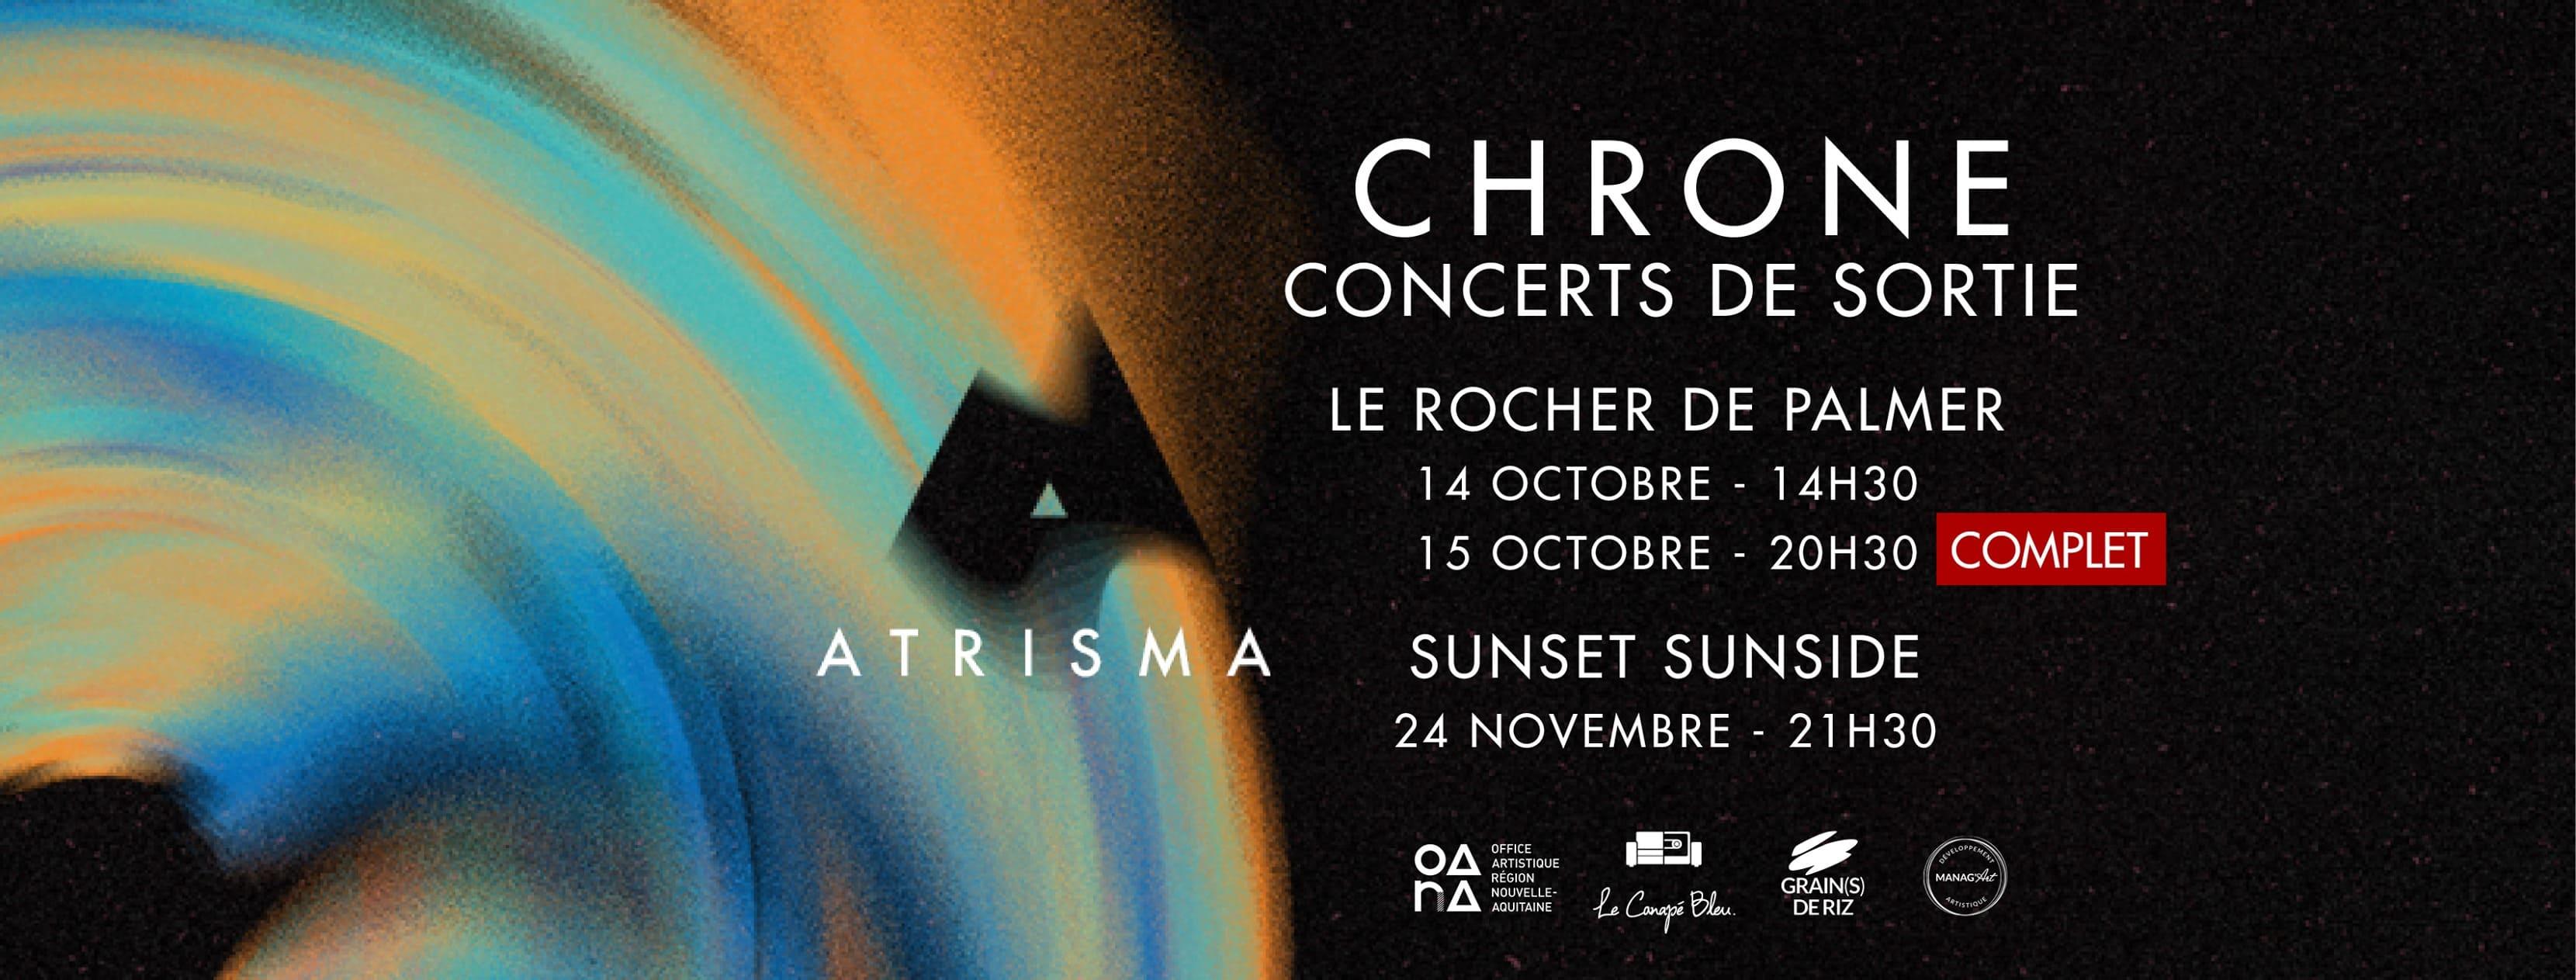 Atrisma chrone release